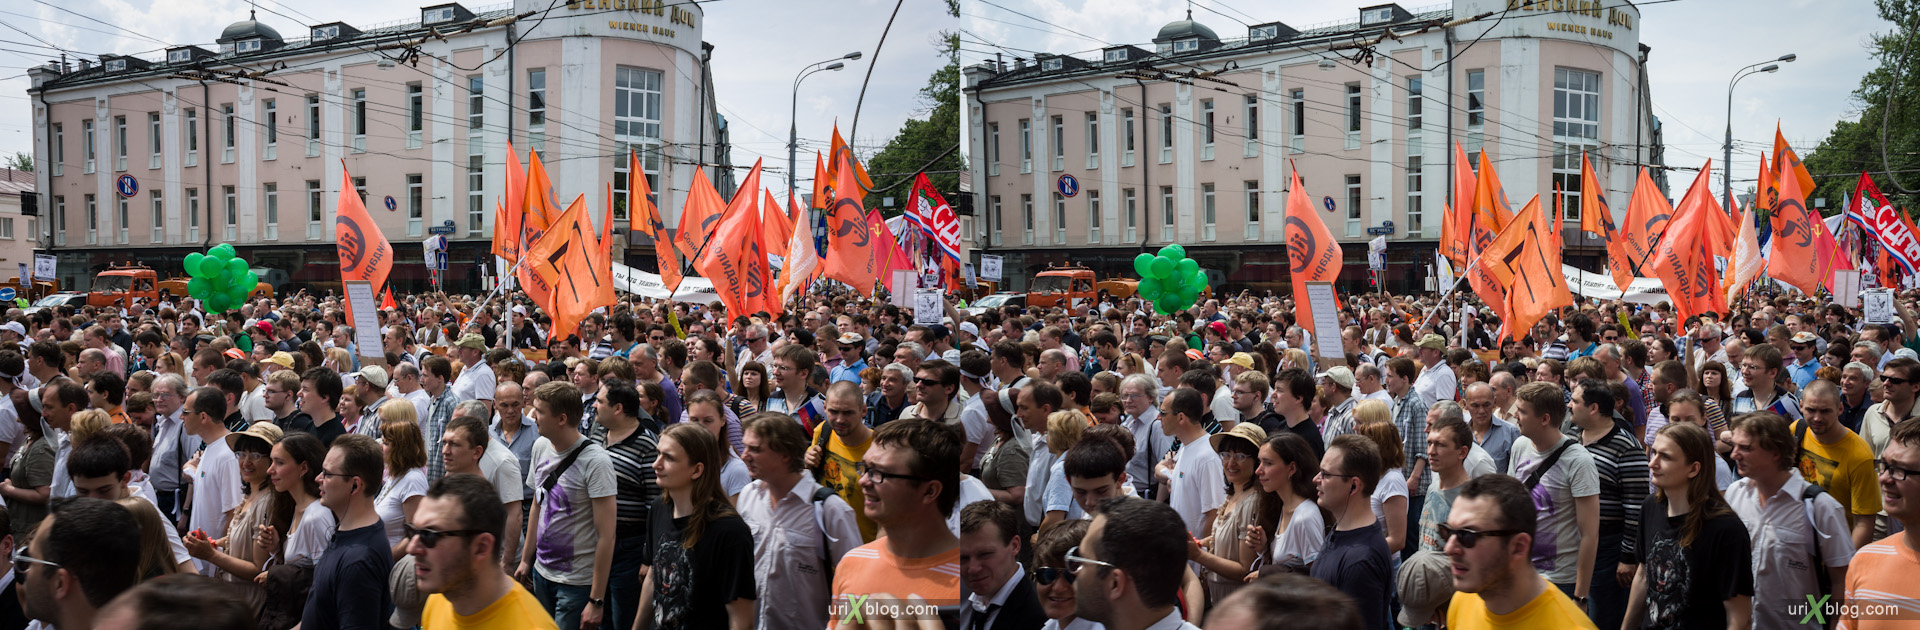 2012 Марш миллионов Москва Россия без Путина митинг шествие стерео 3д stereo 3d March Millions Moscow Russia Protests